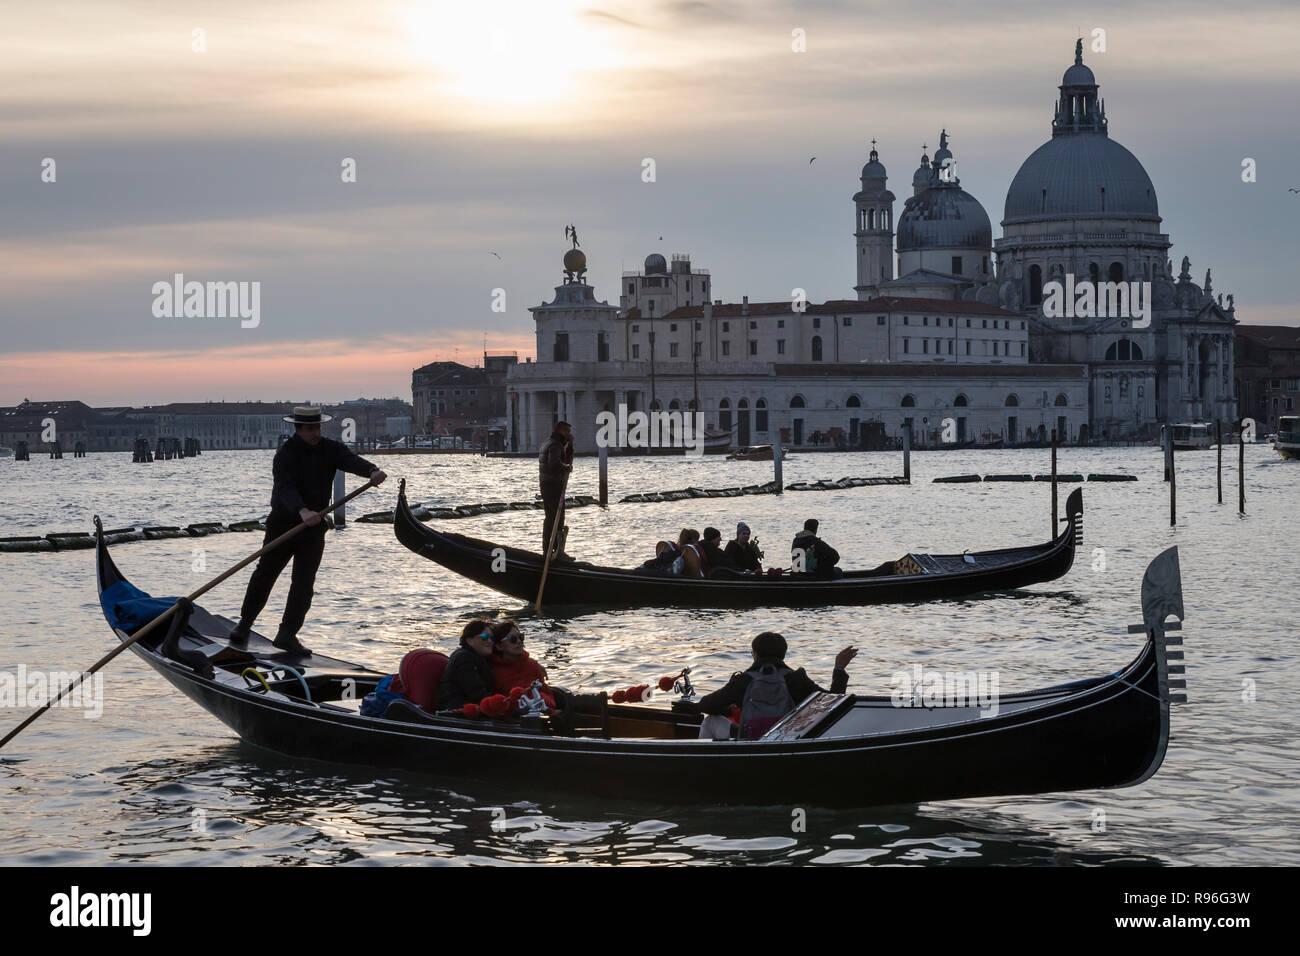 Gondeln und Santa Maria della Salute Basilca, Venedig, Italien Stockfoto